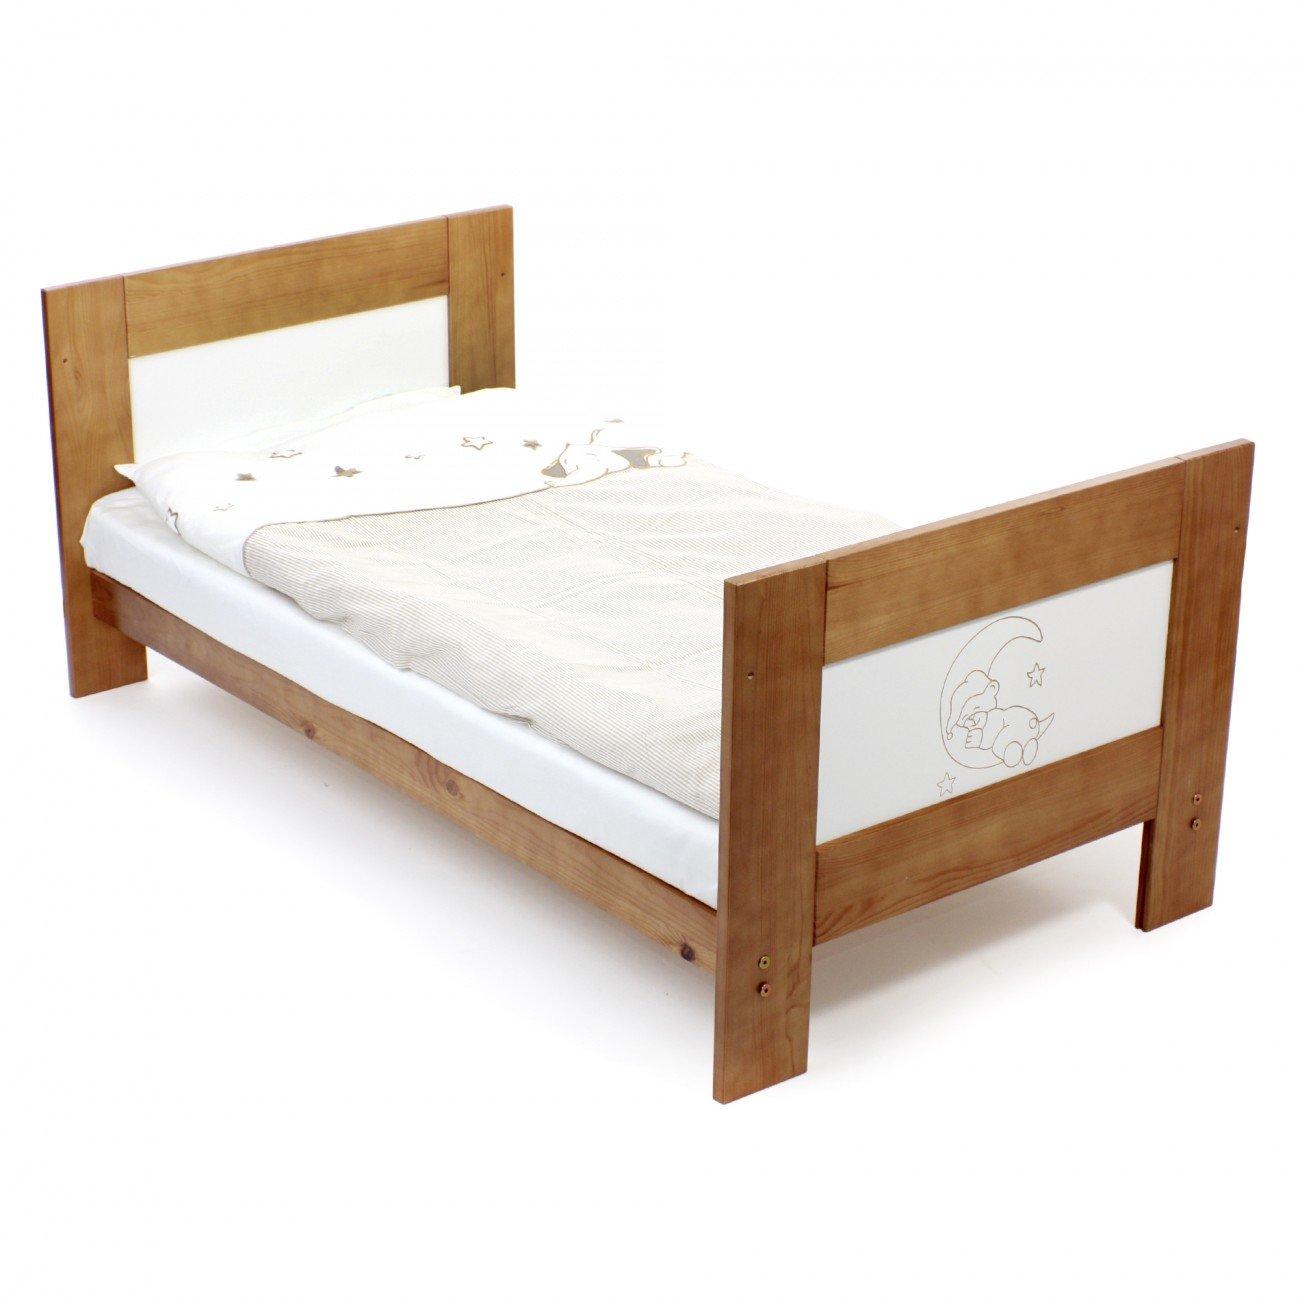 Baby Vivo Kinderbett Juniorbett Babybett Massiv Holz Kiefer 140 X 70 Cm    Teddy: Amazon.de: Baby